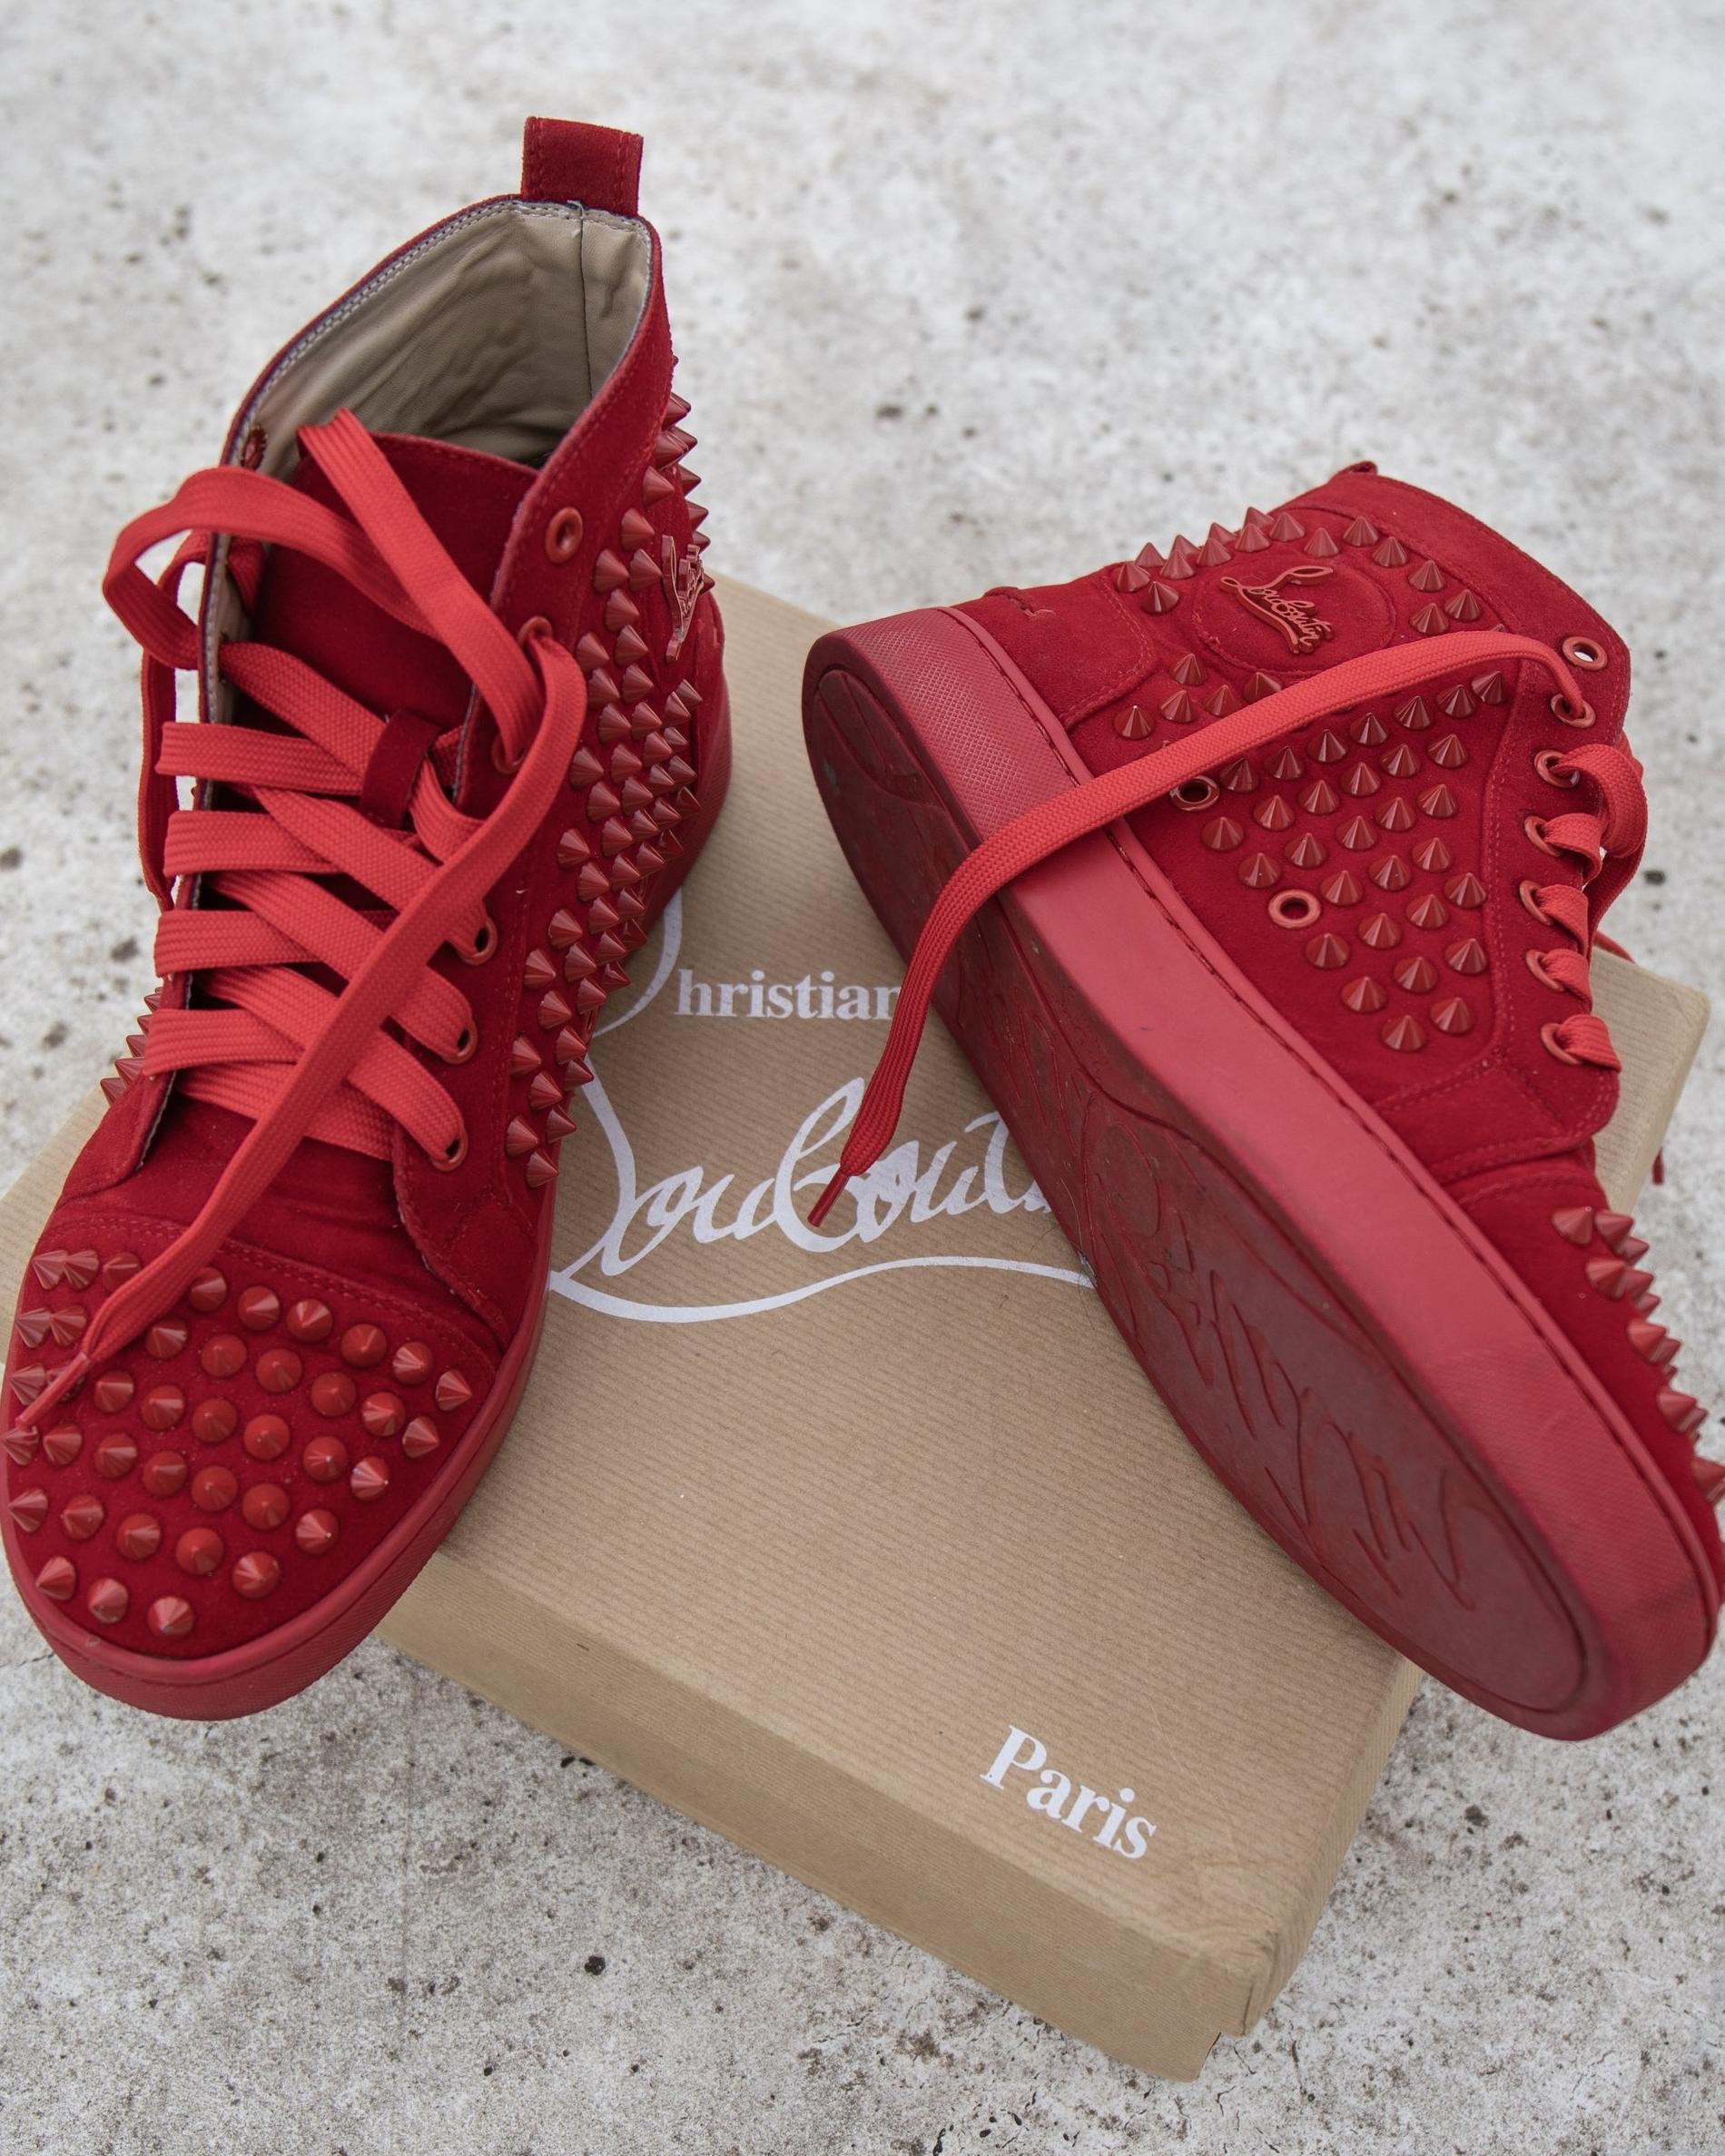 buy louboutin sneakers